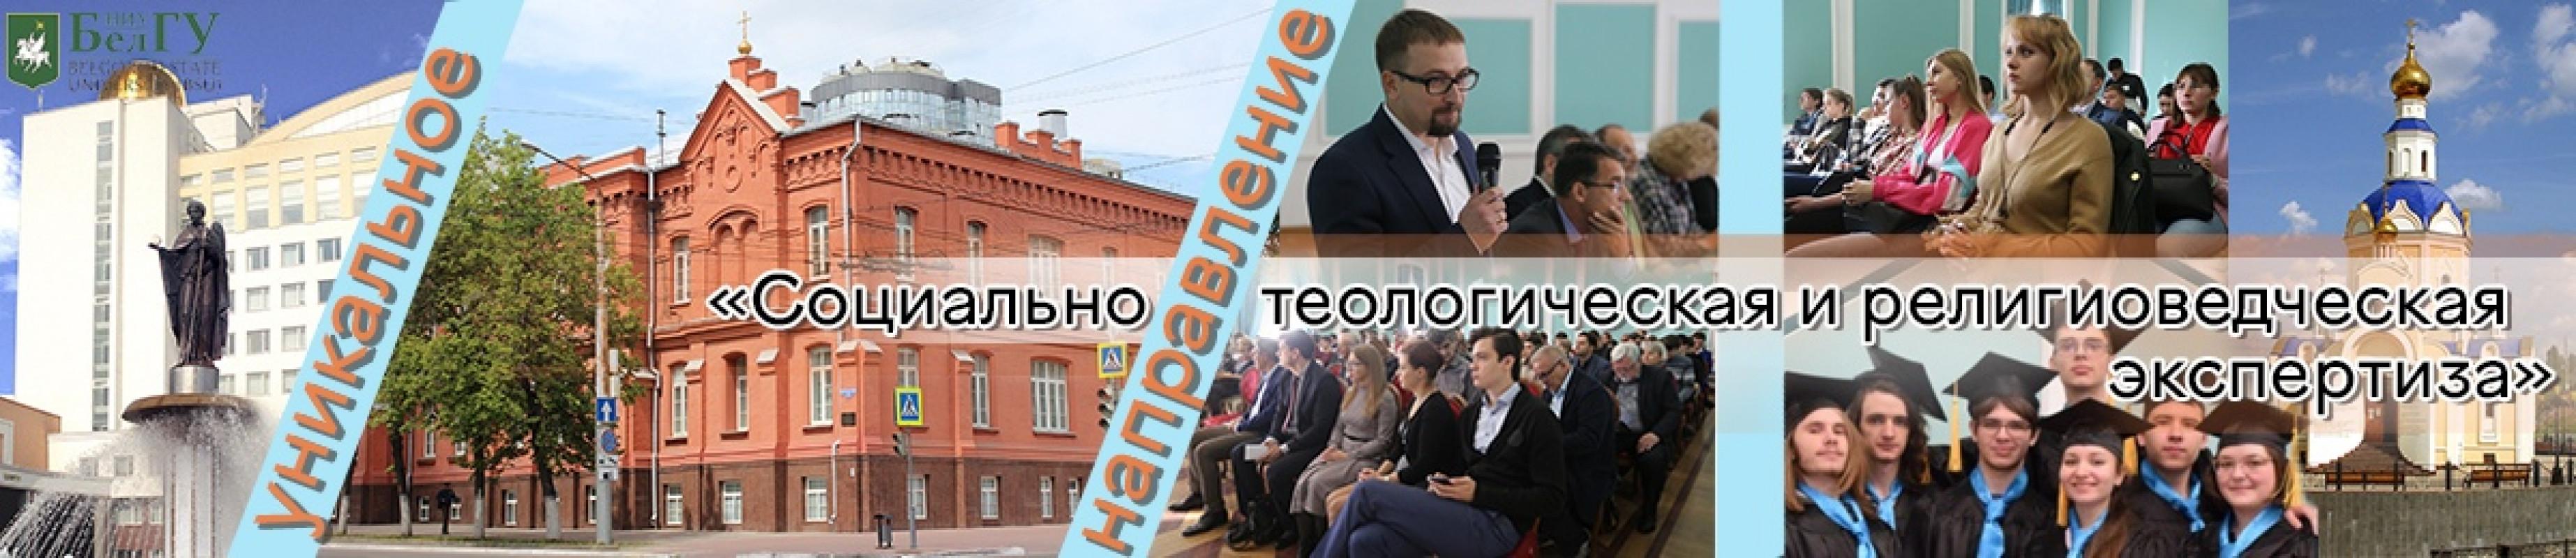 https://beleparh.ru/media/zoo/images/y79ddnzmx7g_1_29cada3948681b29f54eace1c679567a.jpg